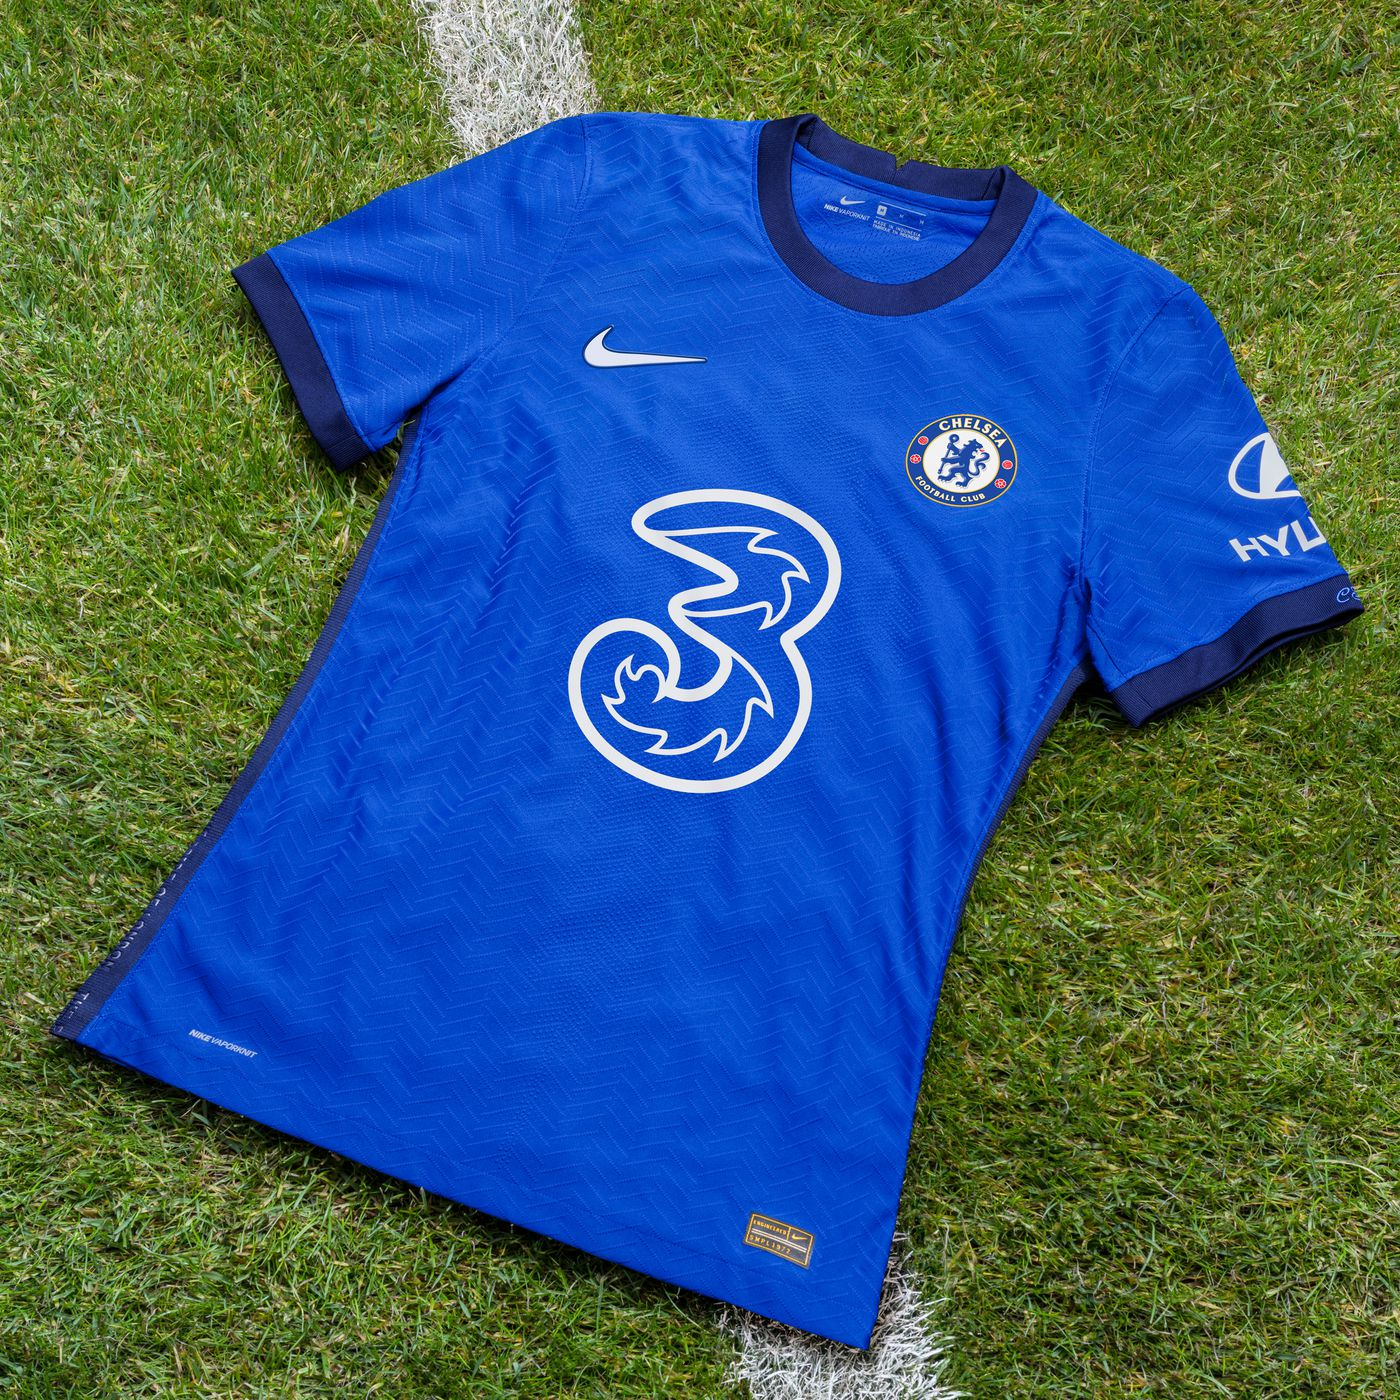 Nike, Three UK unveil new Chelsea home kit for 2020-21 season - We ...